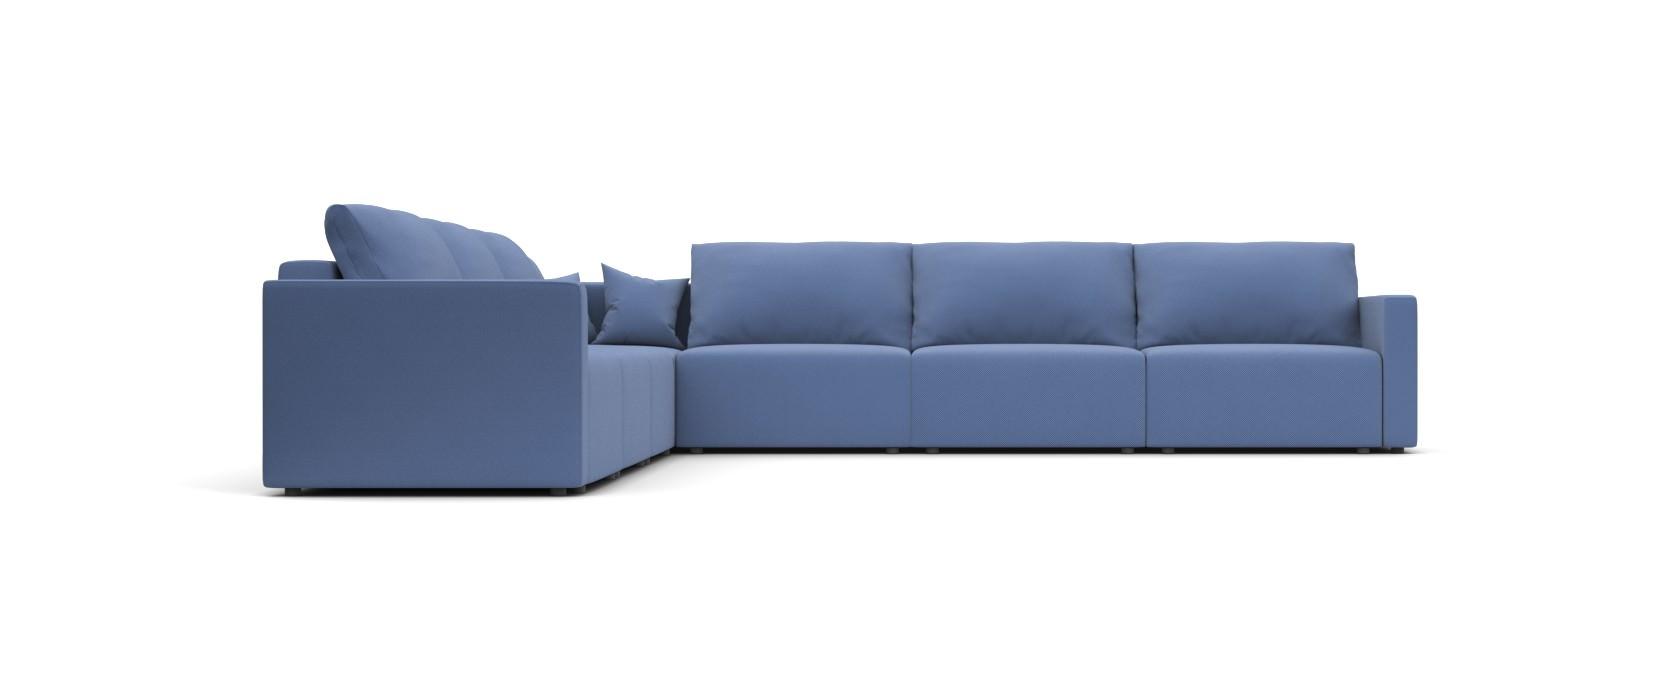 Модульний диван Greta 417x417 - Pufetto